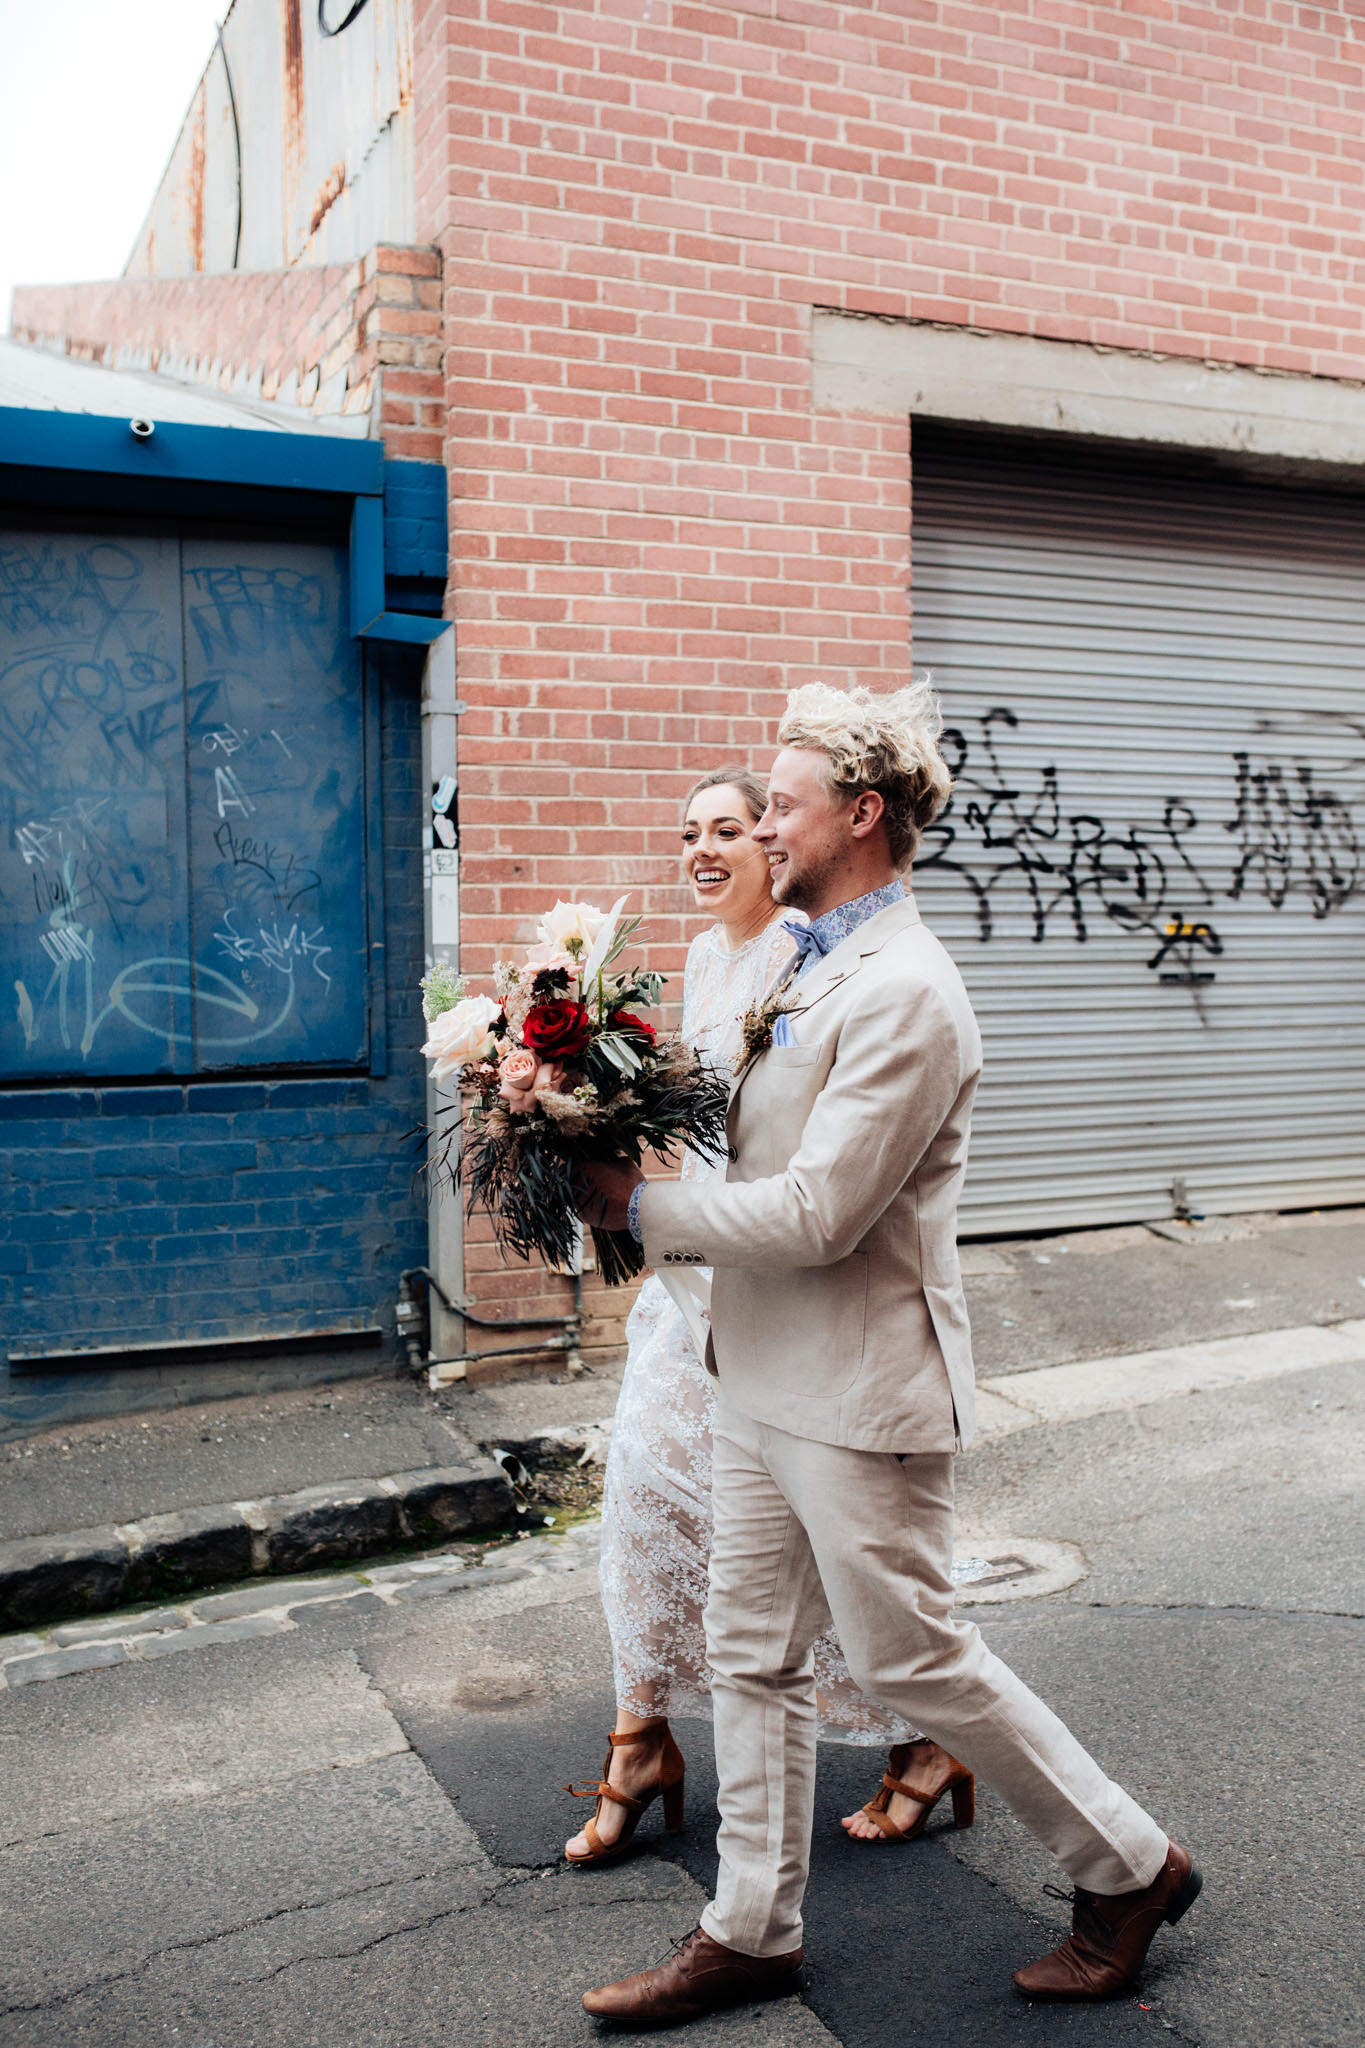 Aster and Rose - Wedding Planner and Co-ordinator - Torquay, Geelong, Surfcoast - Summer Wedding-129.jpg